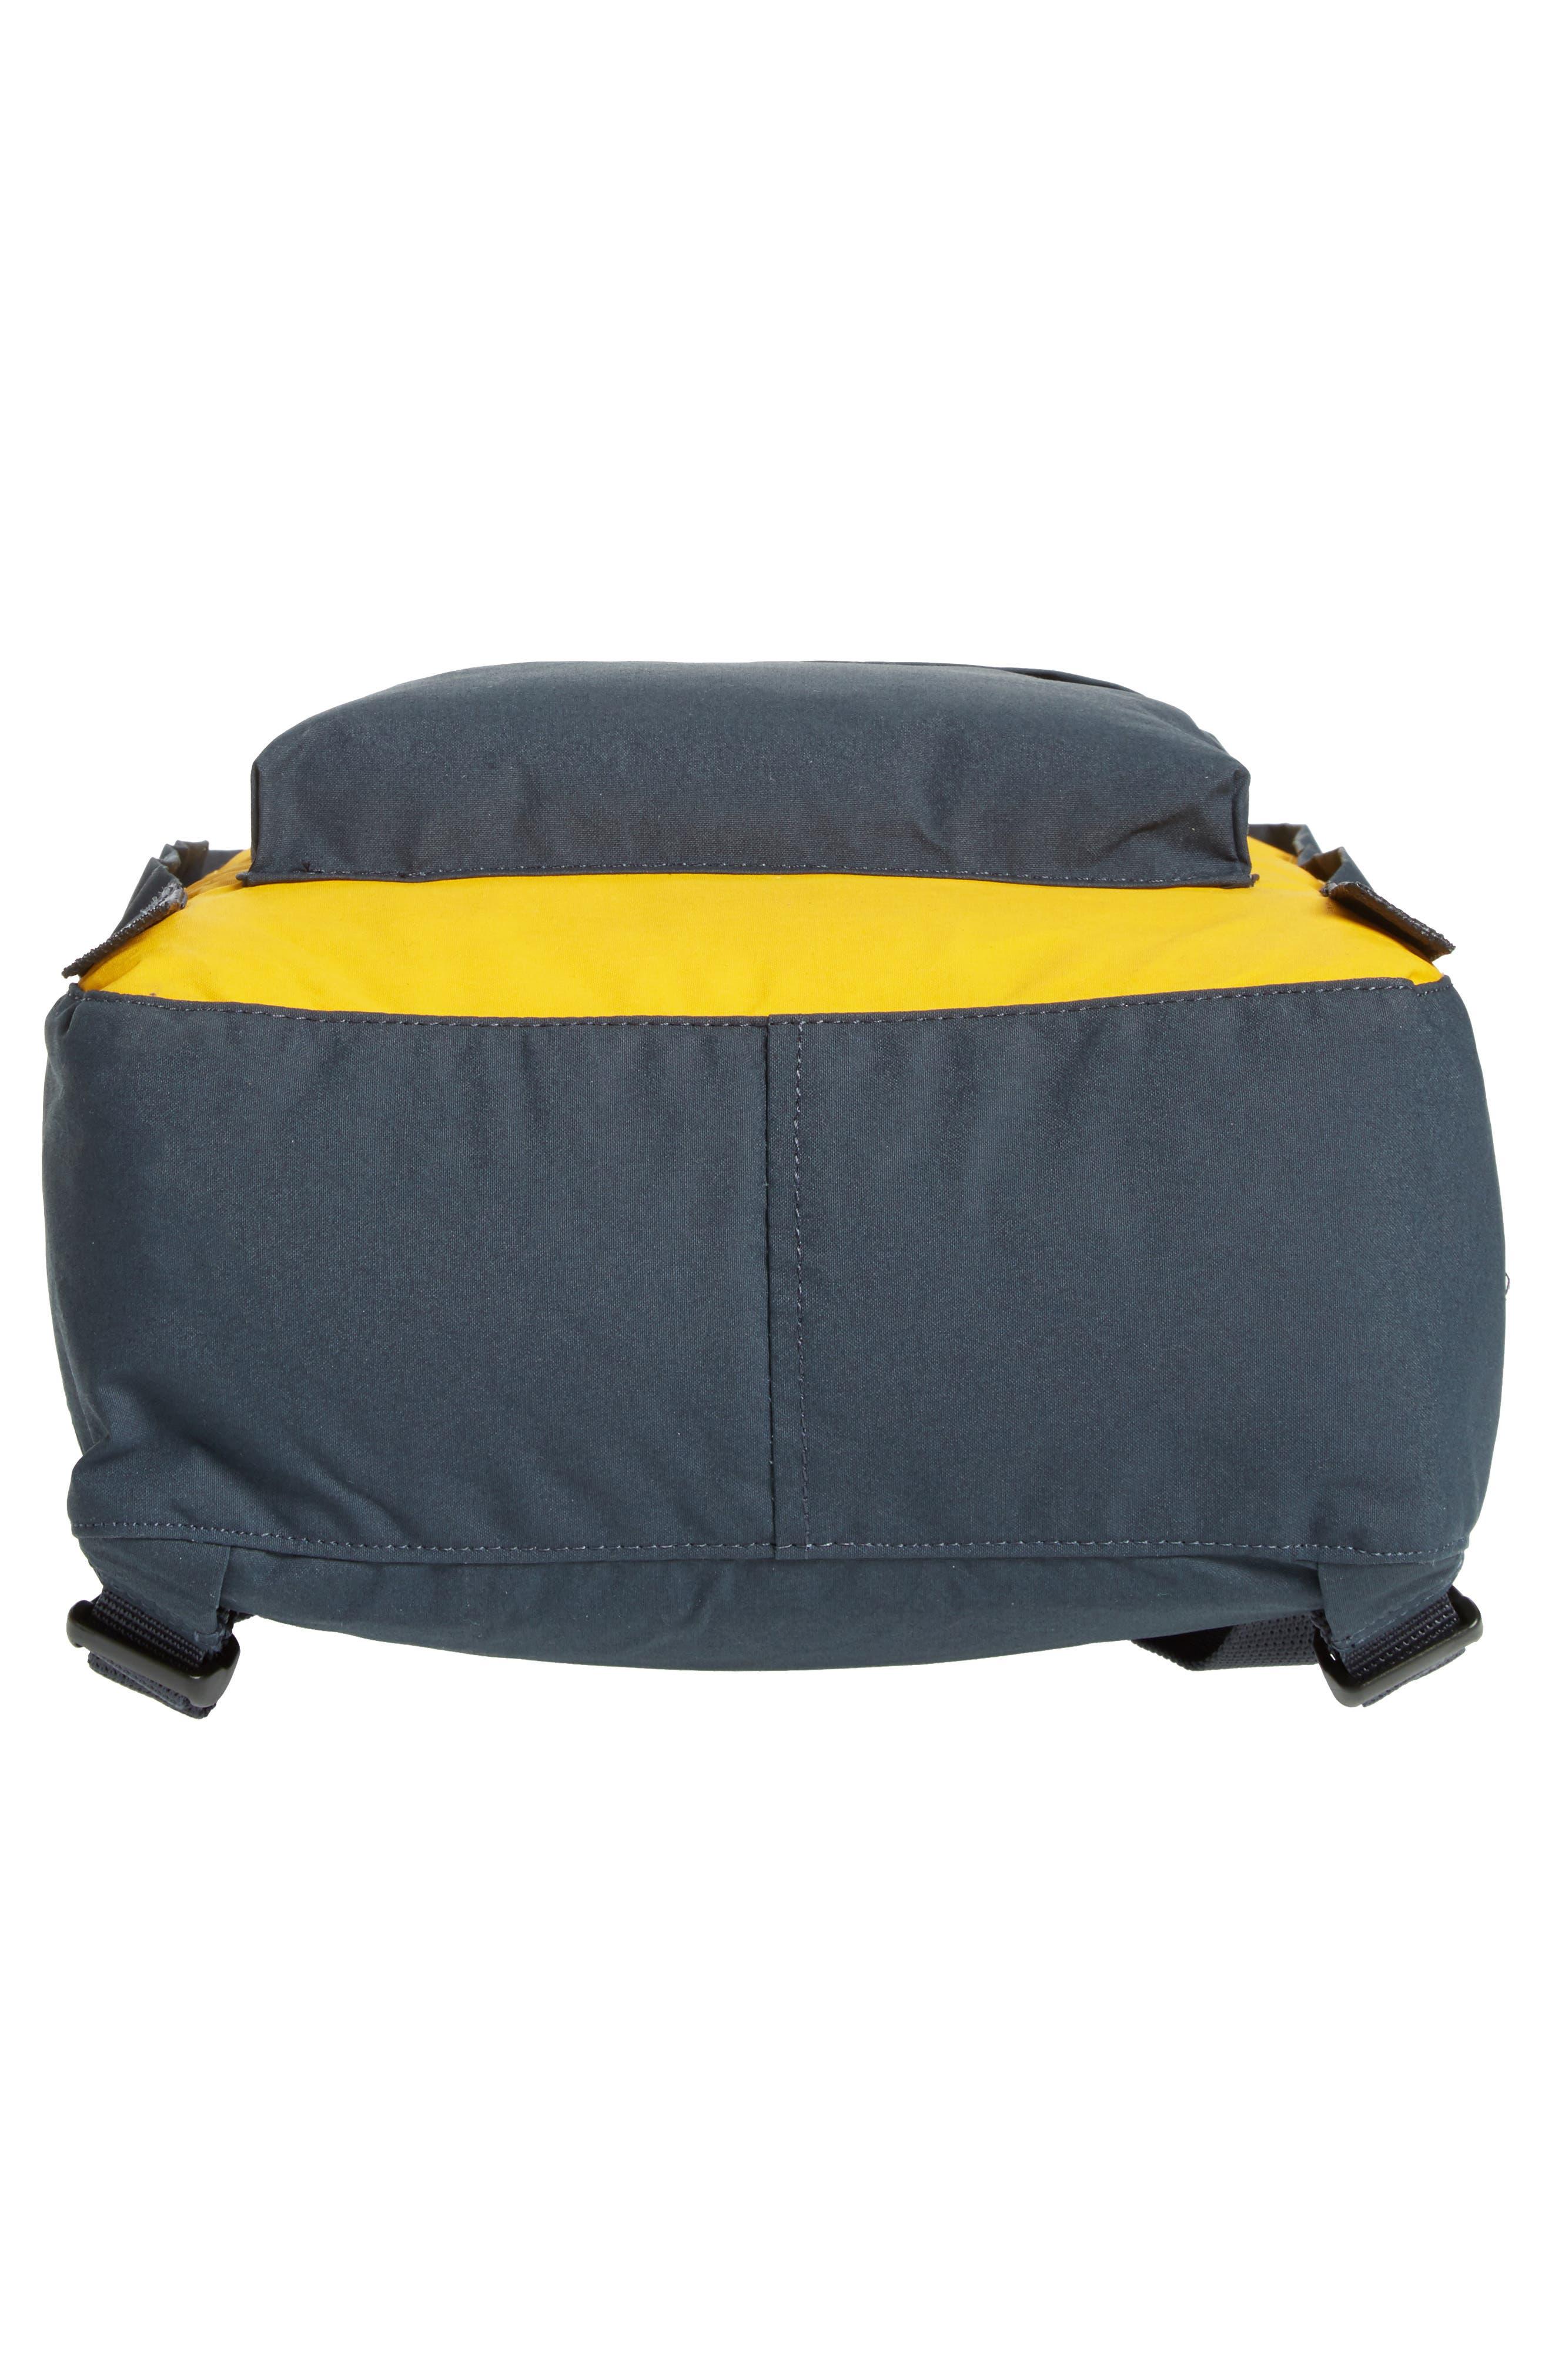 'Kånken' Water Resistant Backpack,                             Alternate thumbnail 332, color,